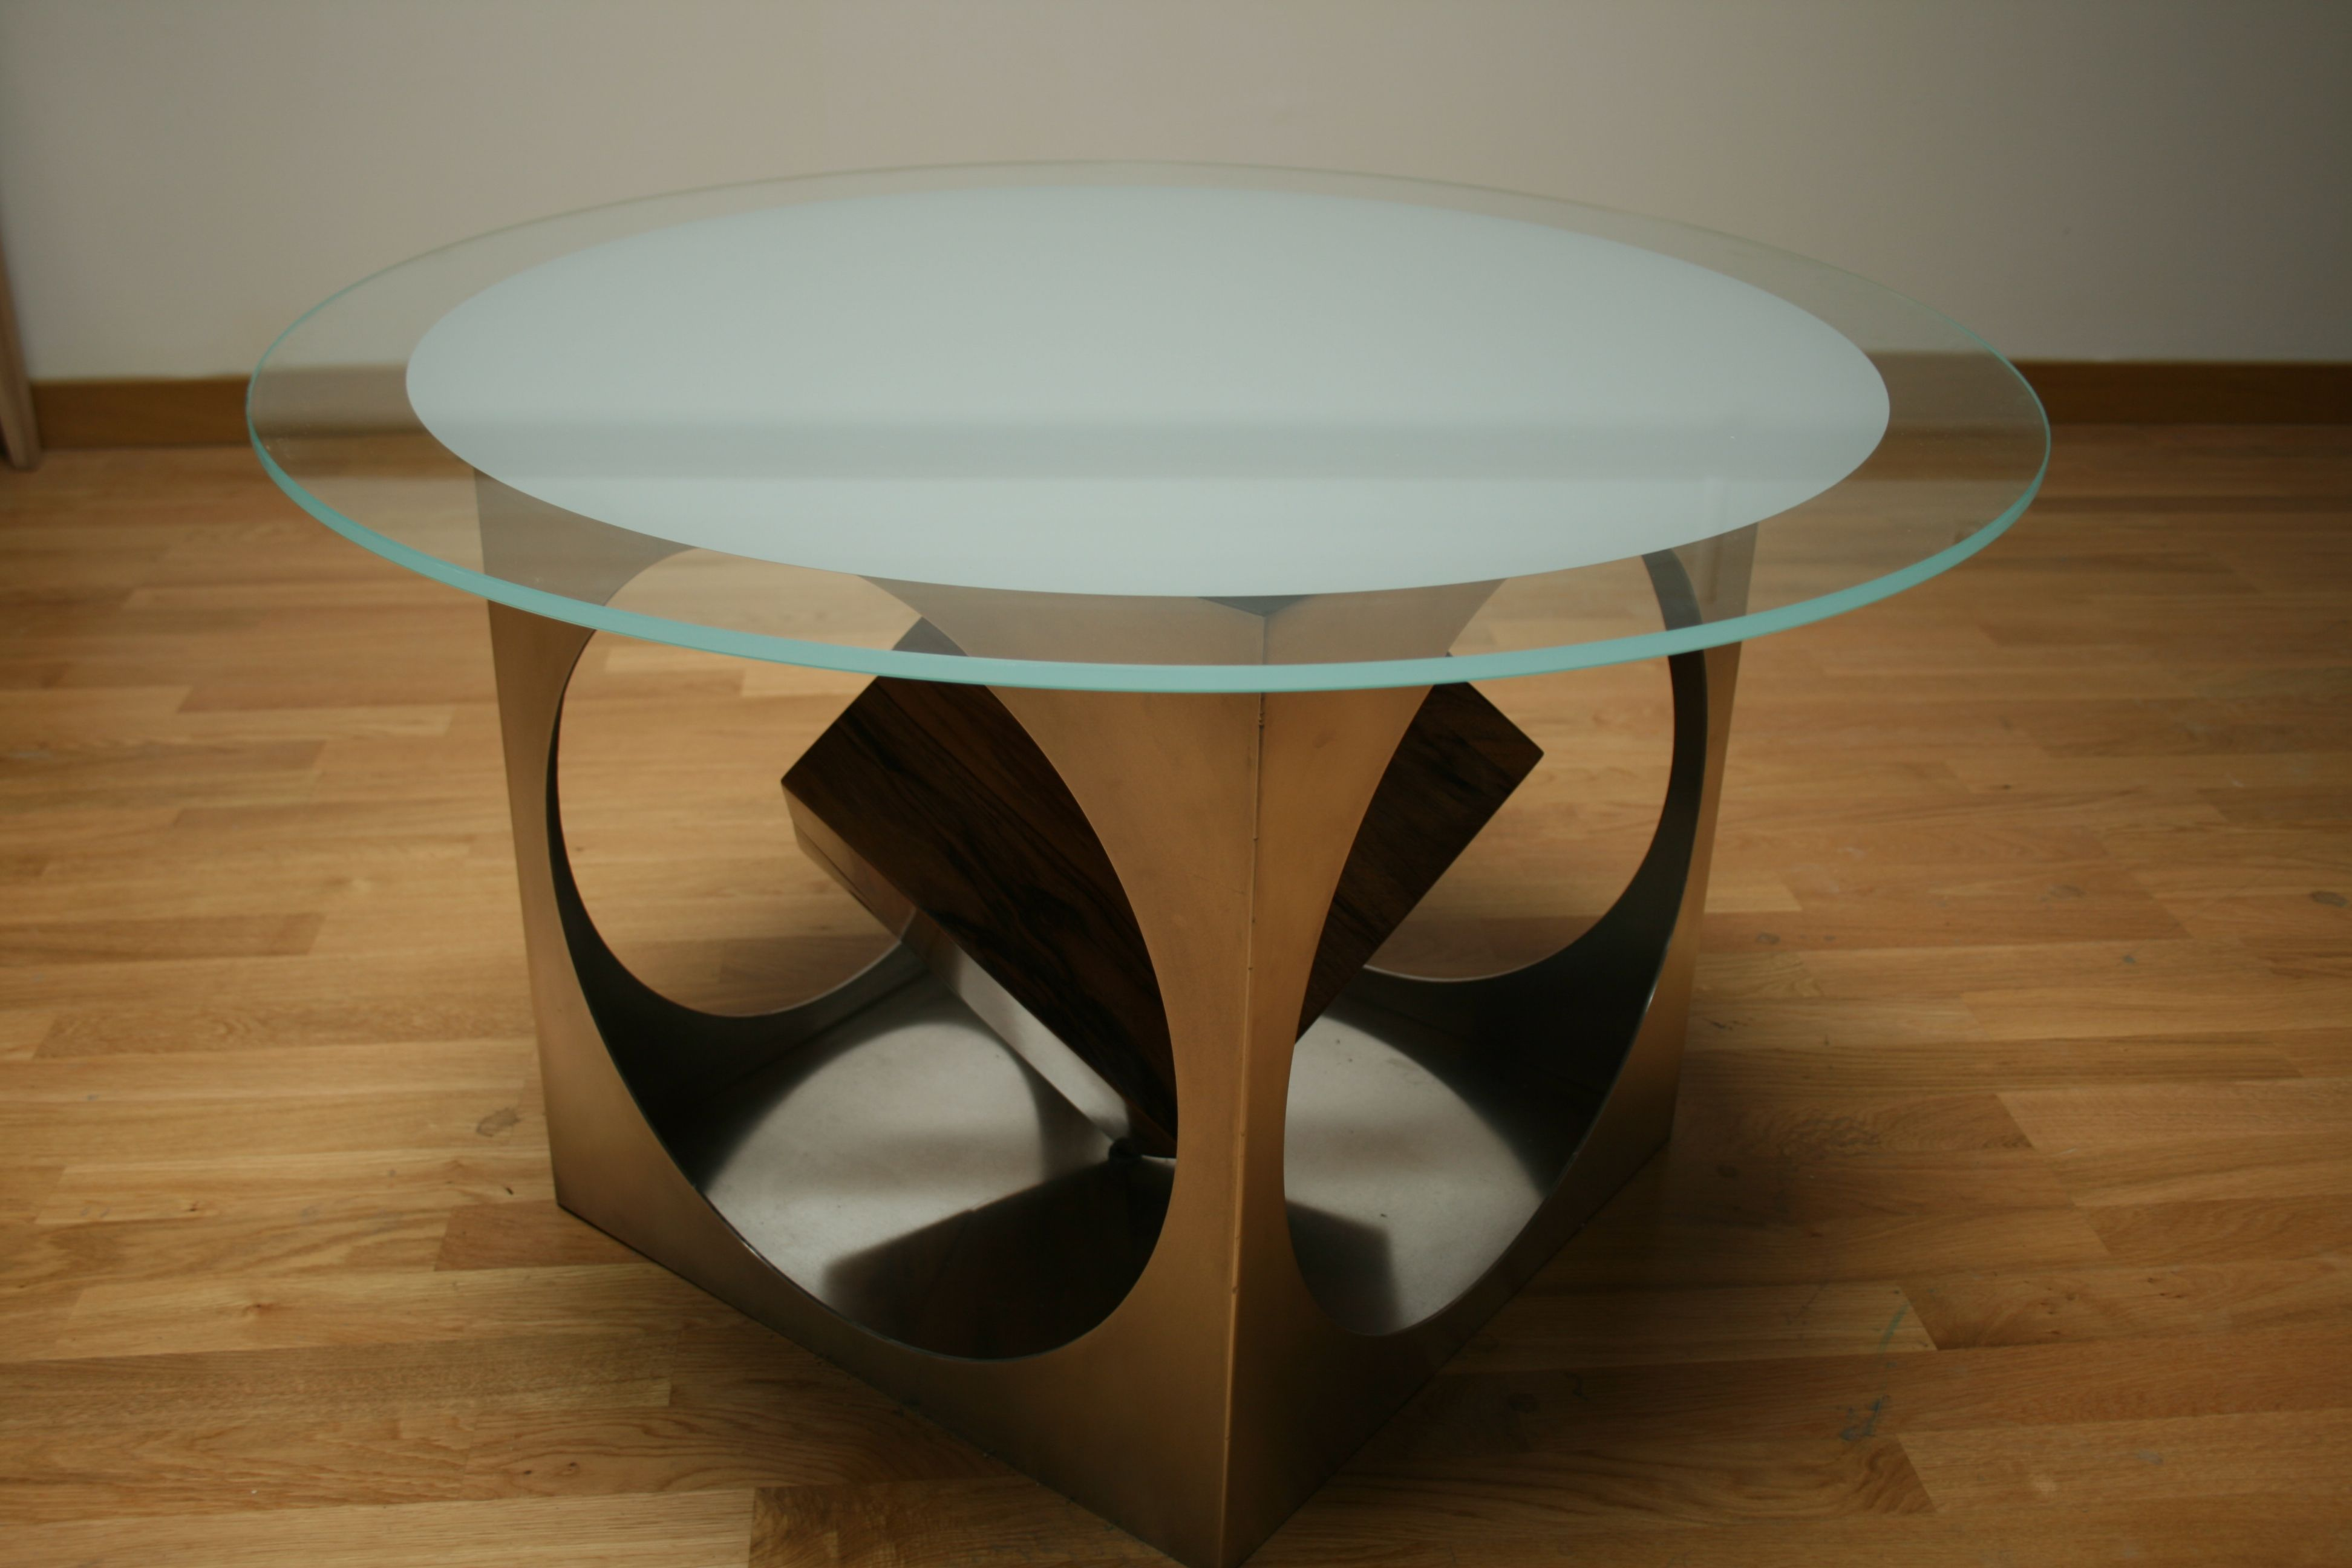 40569f312a646fb46a586a4d6f805e1b Unique De Table Basse Noyer Design Concept